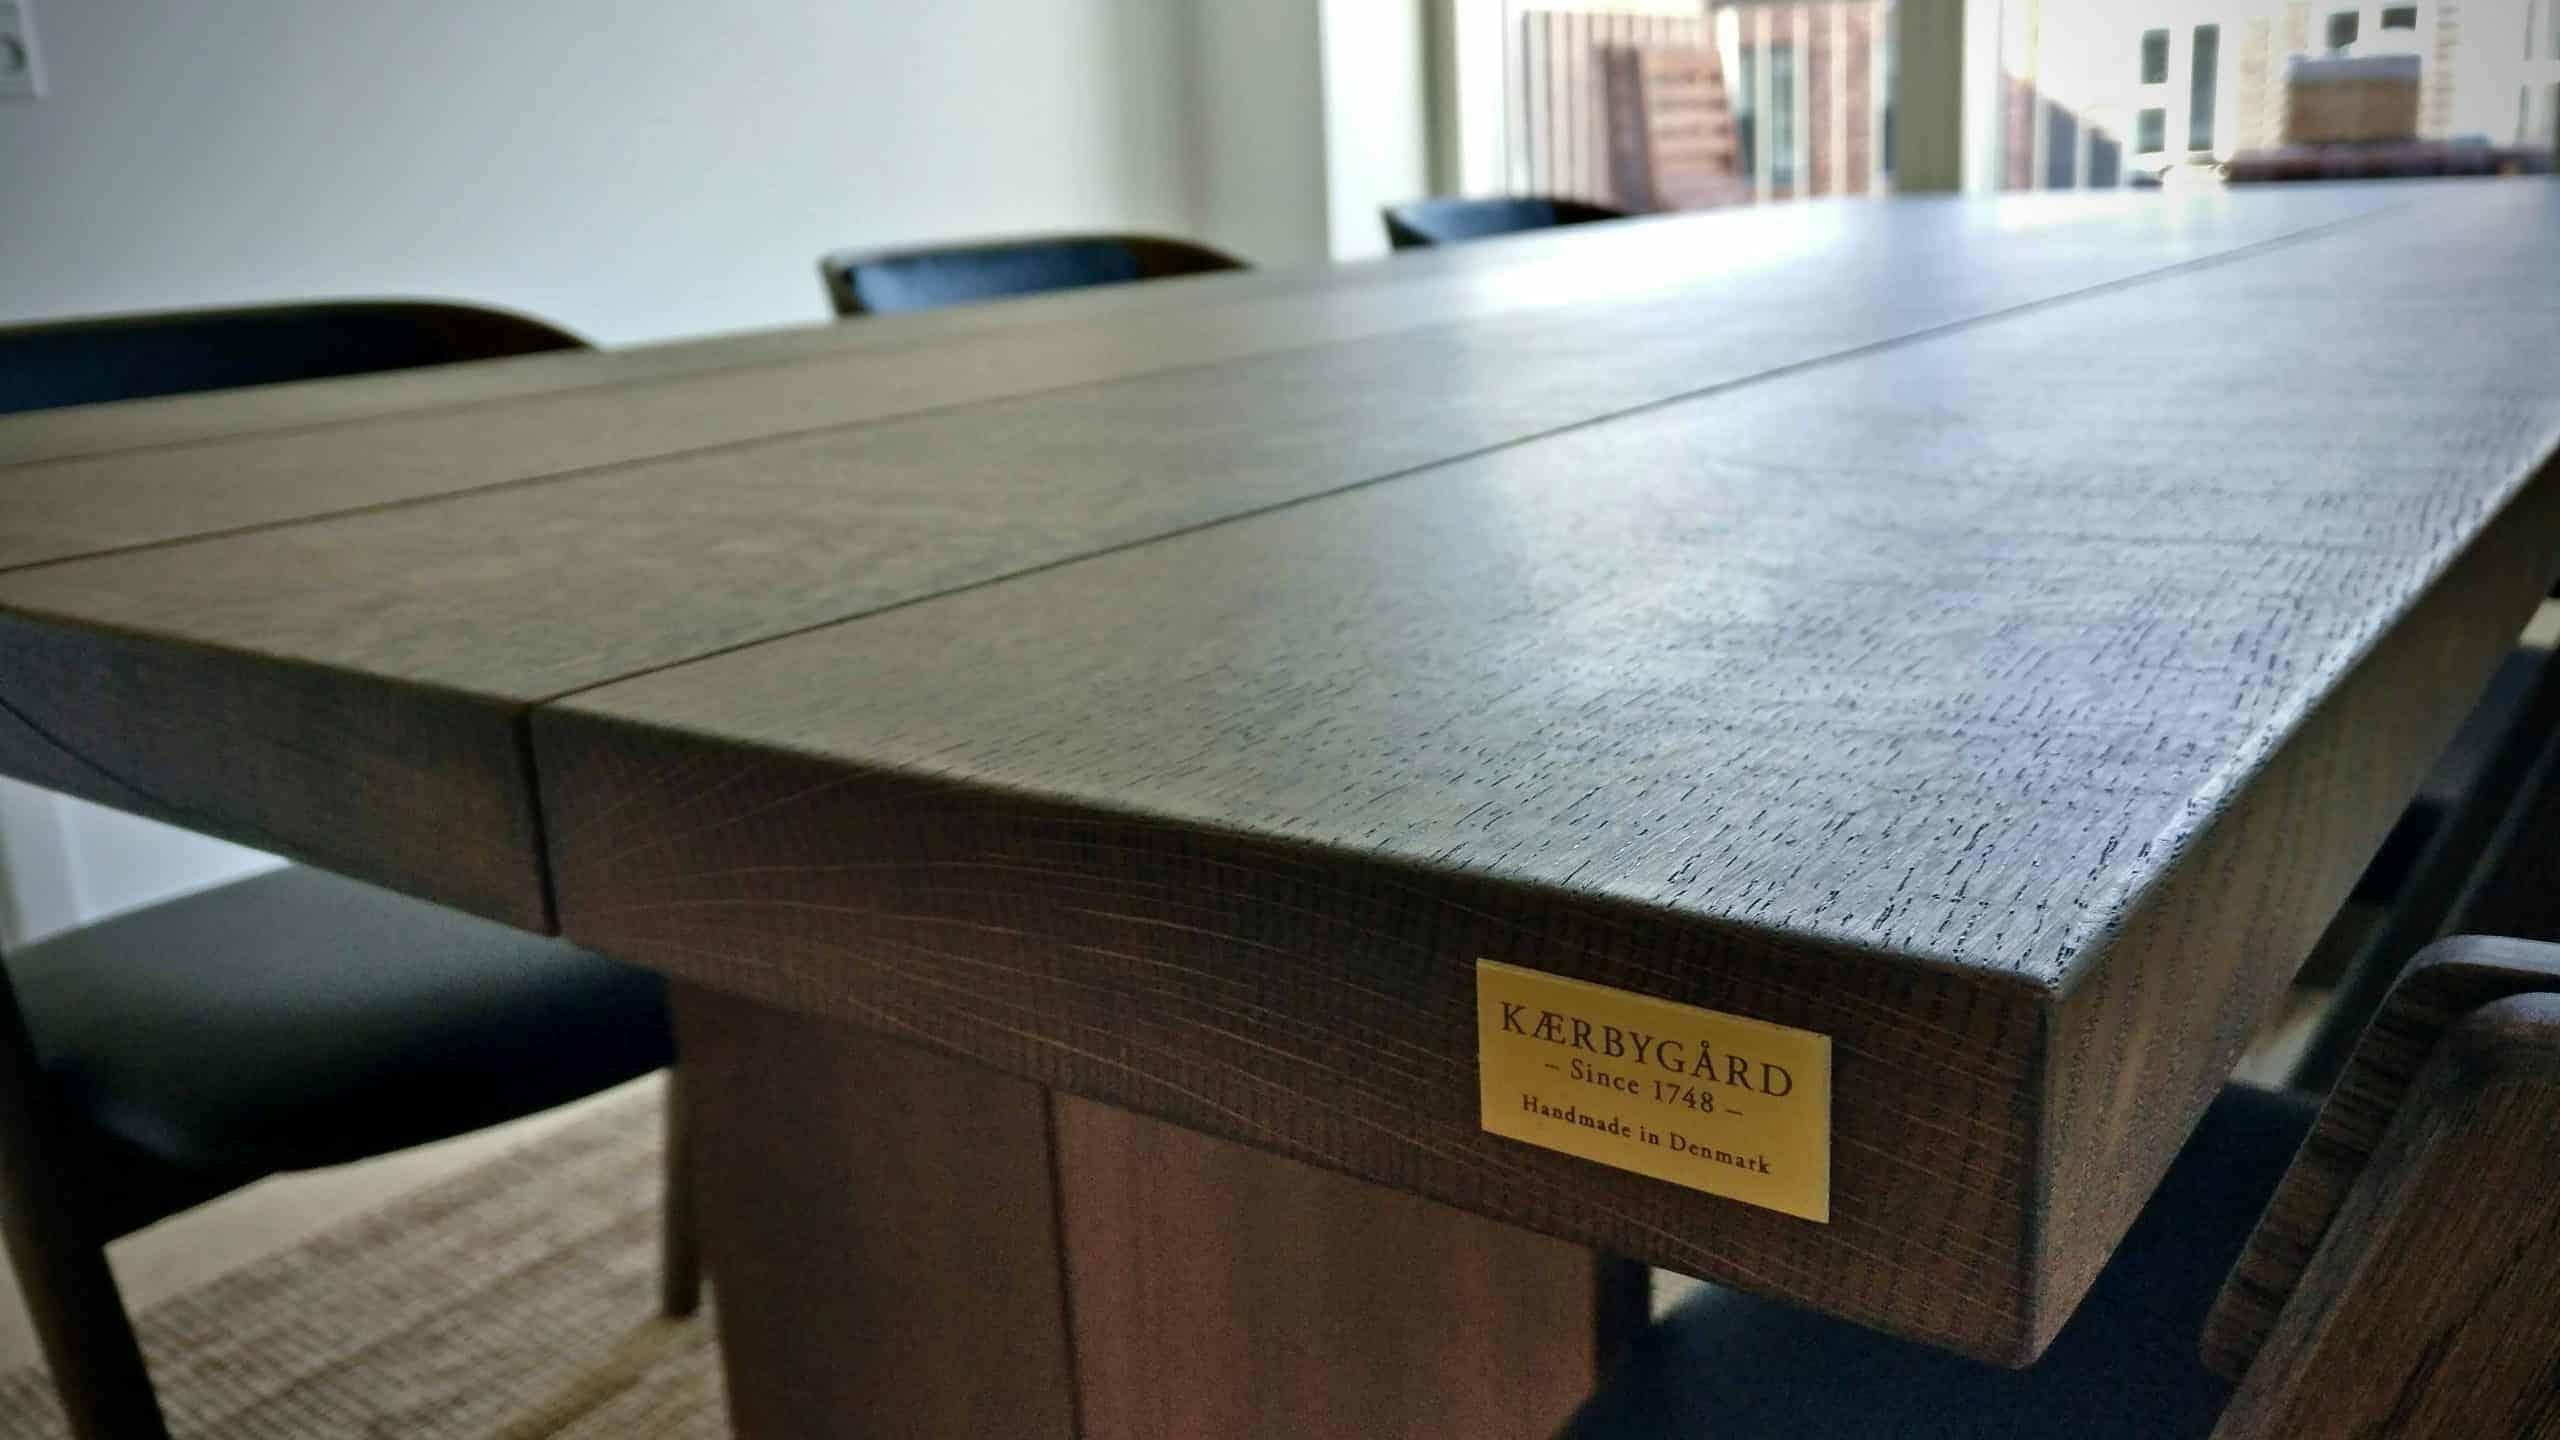 Snedkerbord Mette spisebordsstol Kaerbygård 4 planke indoor indendoers mette spisebordsstol 3 scaled